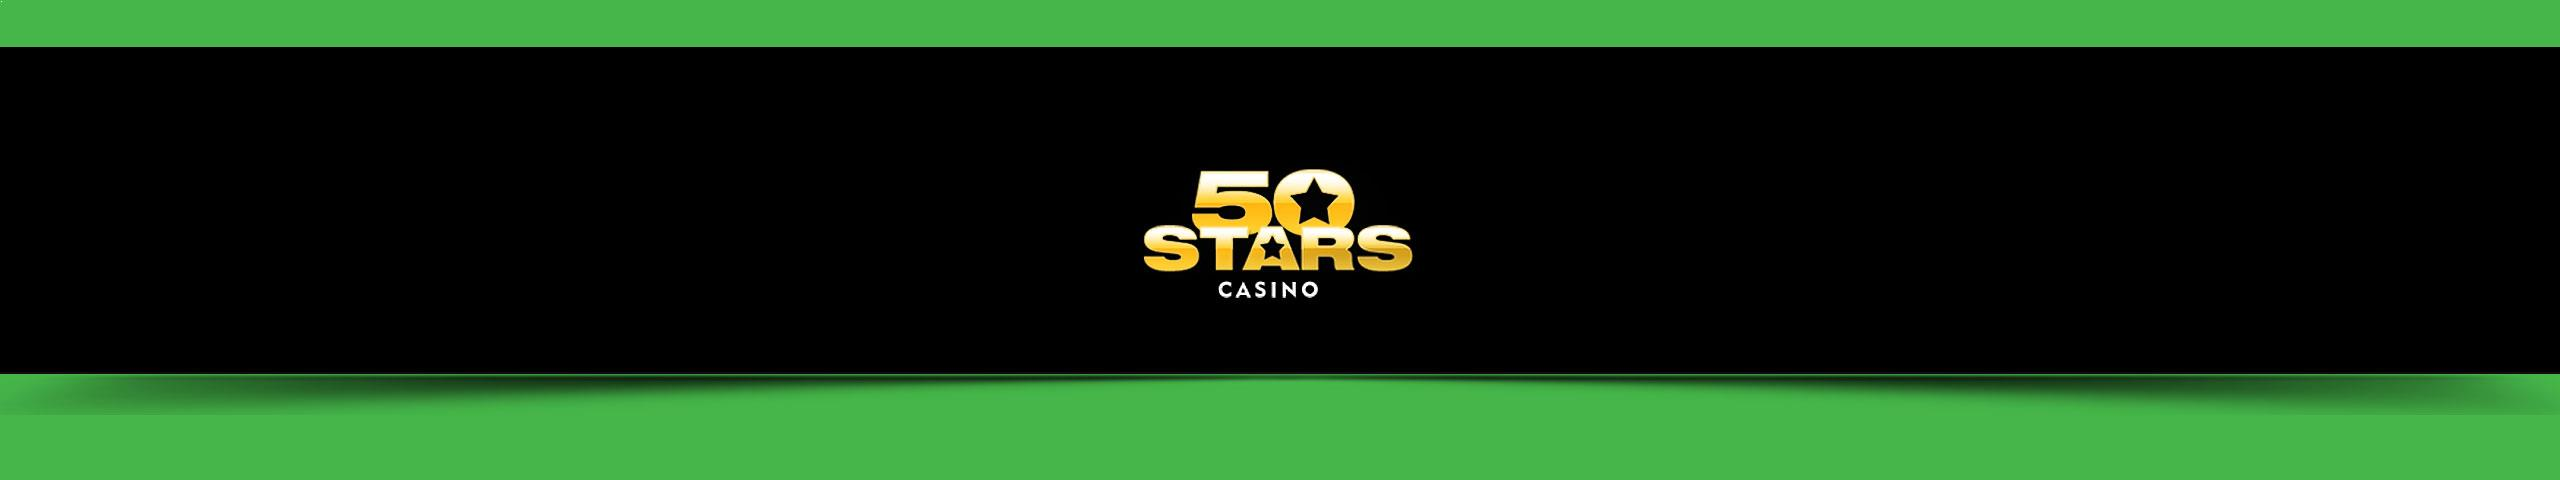 Vizualizarea Cazinoului 50 Stars - Multabafta.com Slider